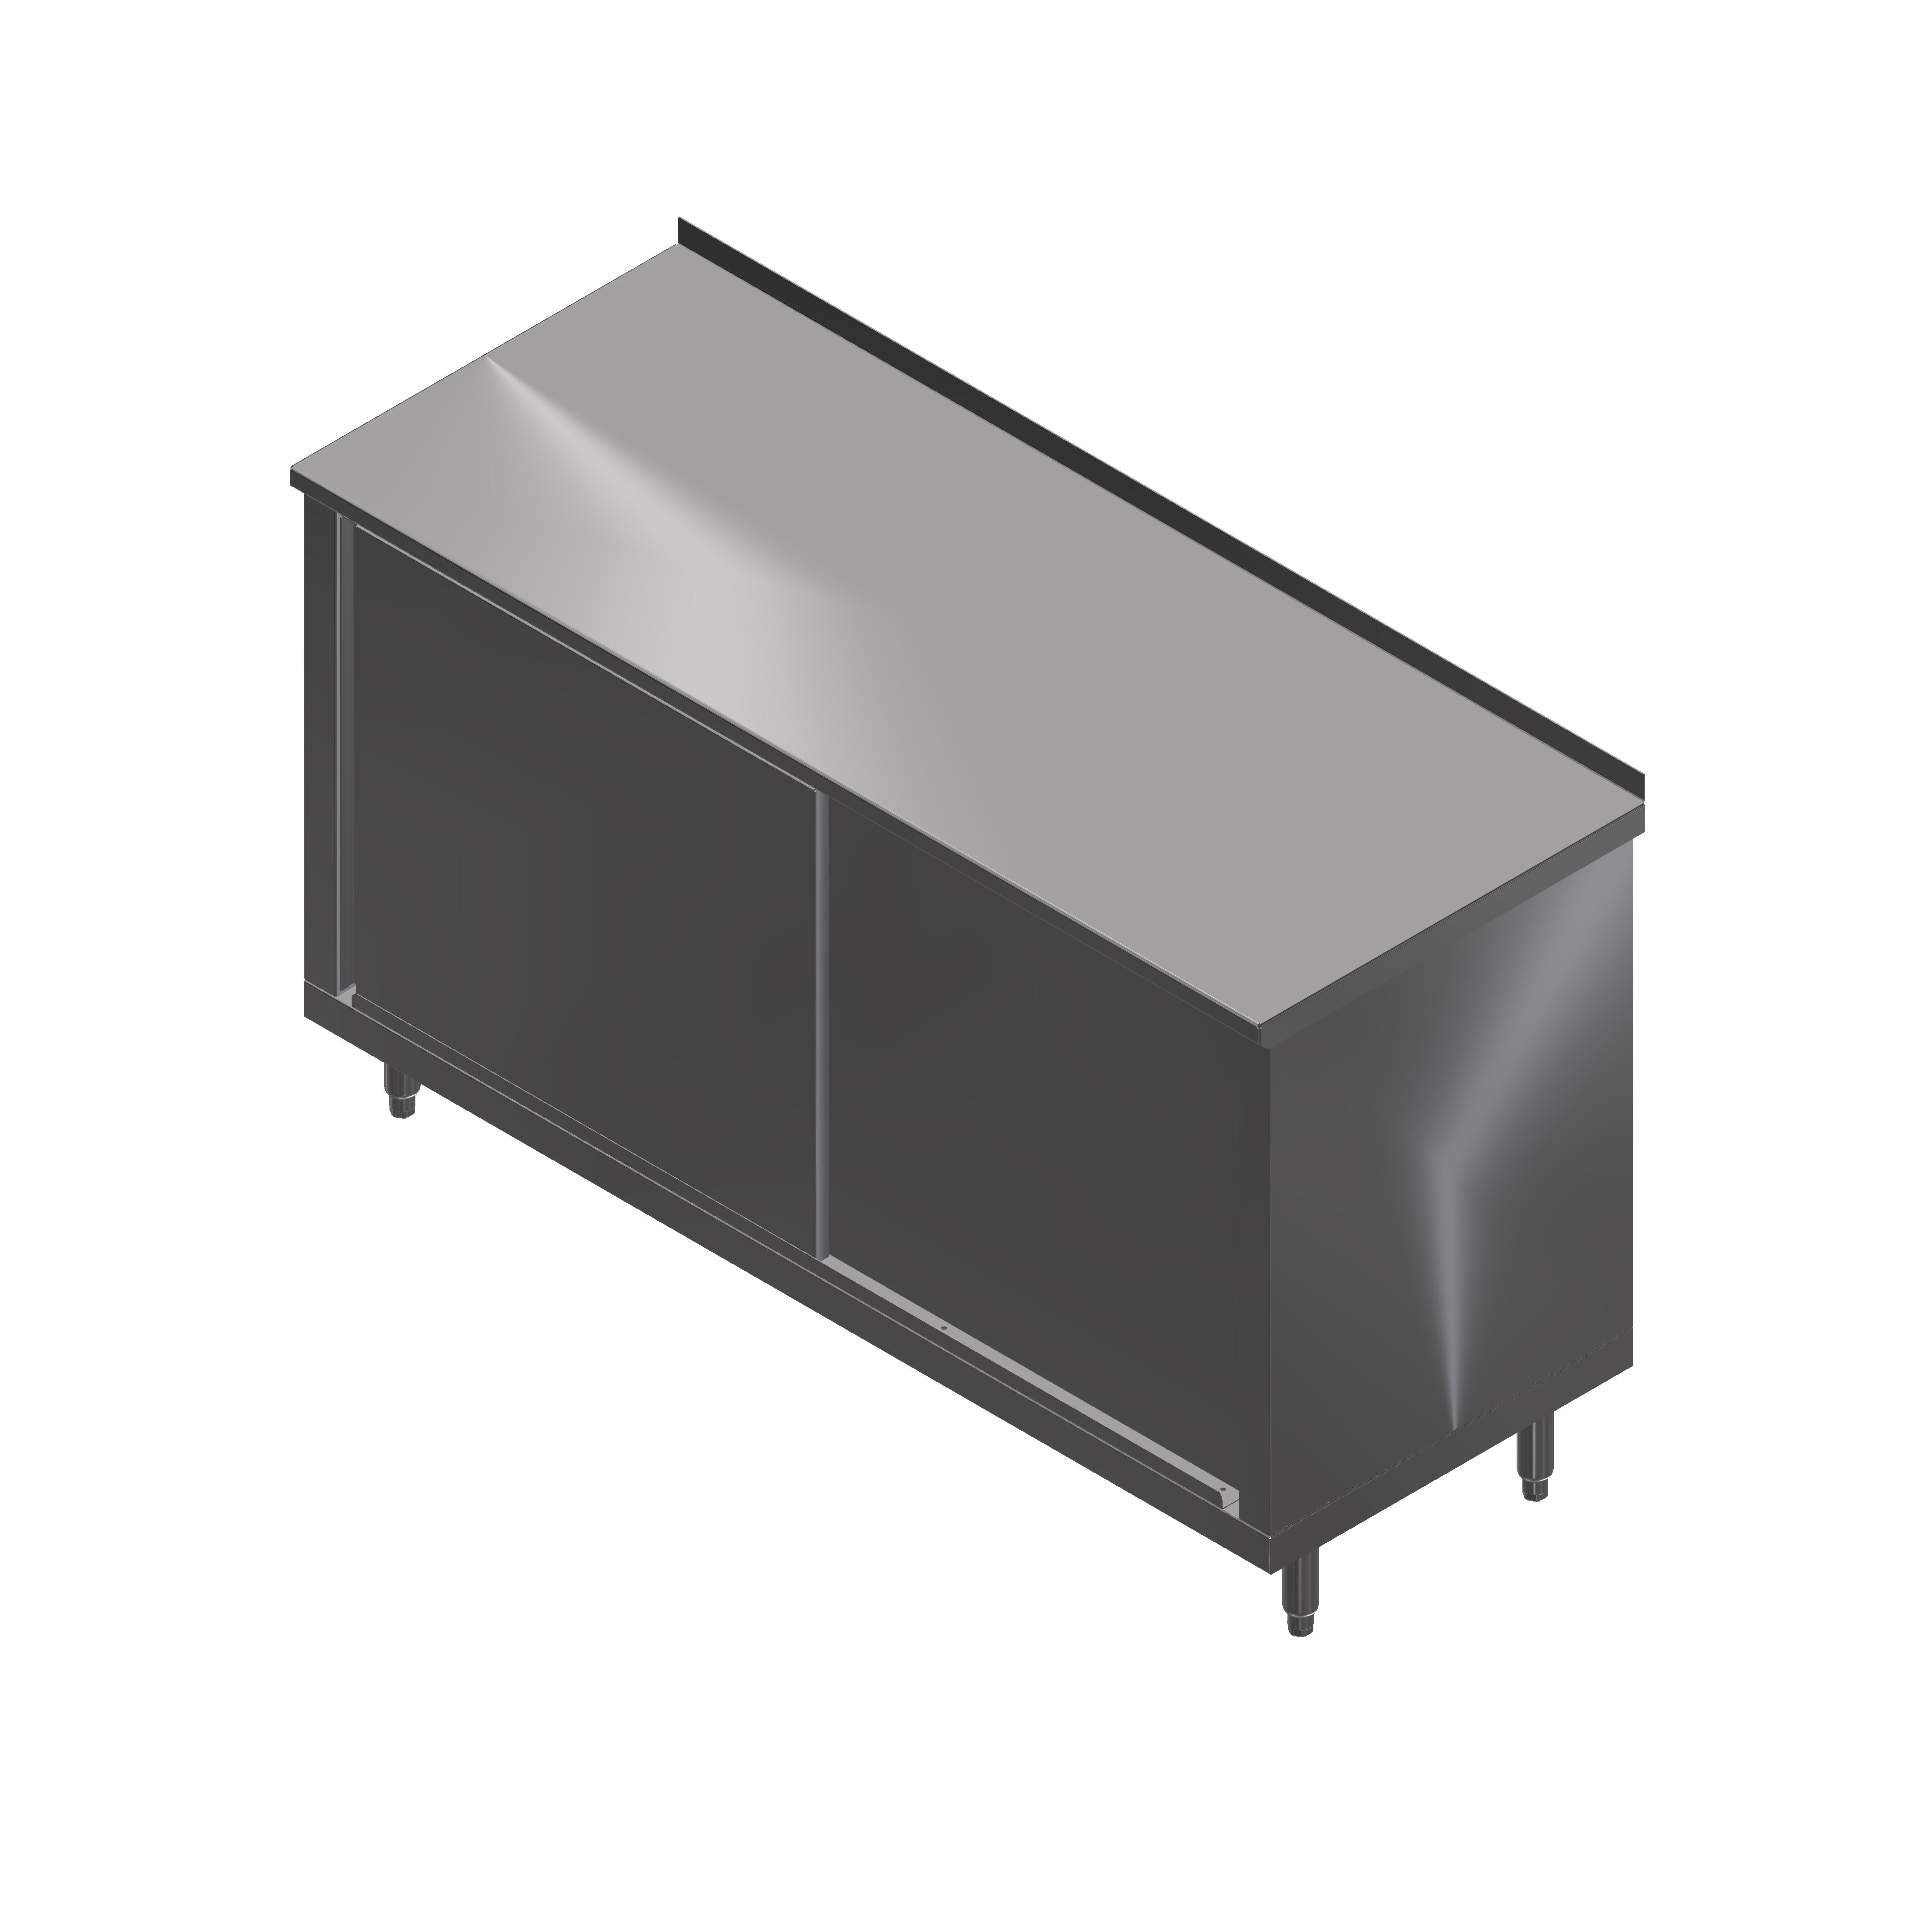 John Boos 4CS4R1.5-3660 work table, cabinet base sliding doors